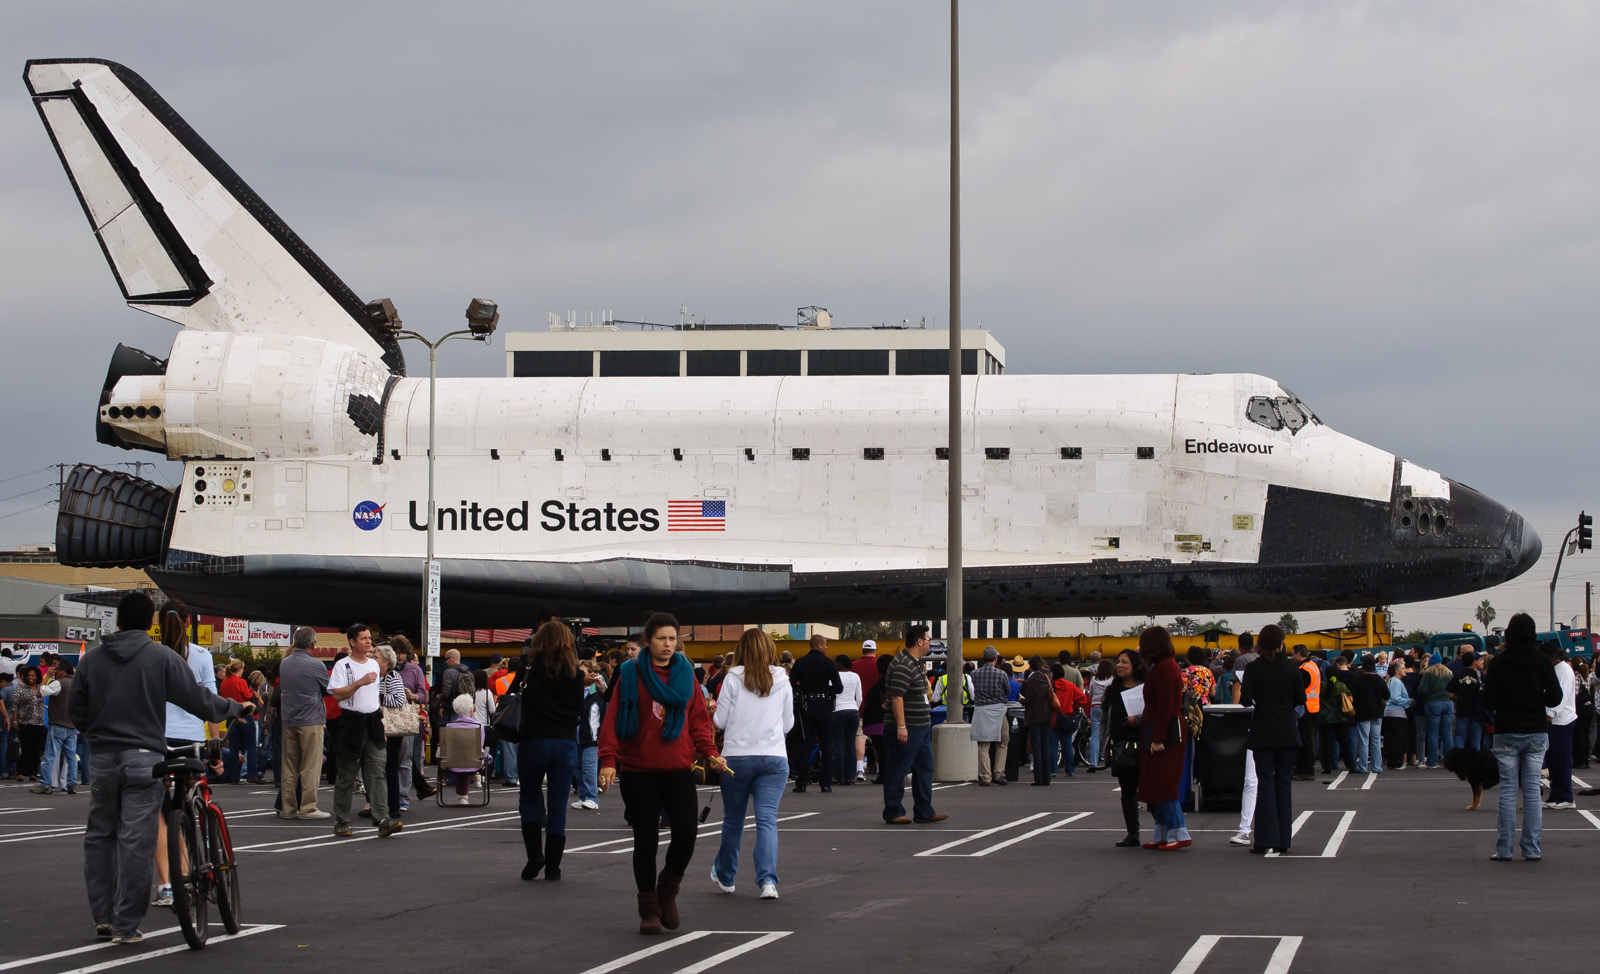 space shuttle endeavour dimensions - photo #12